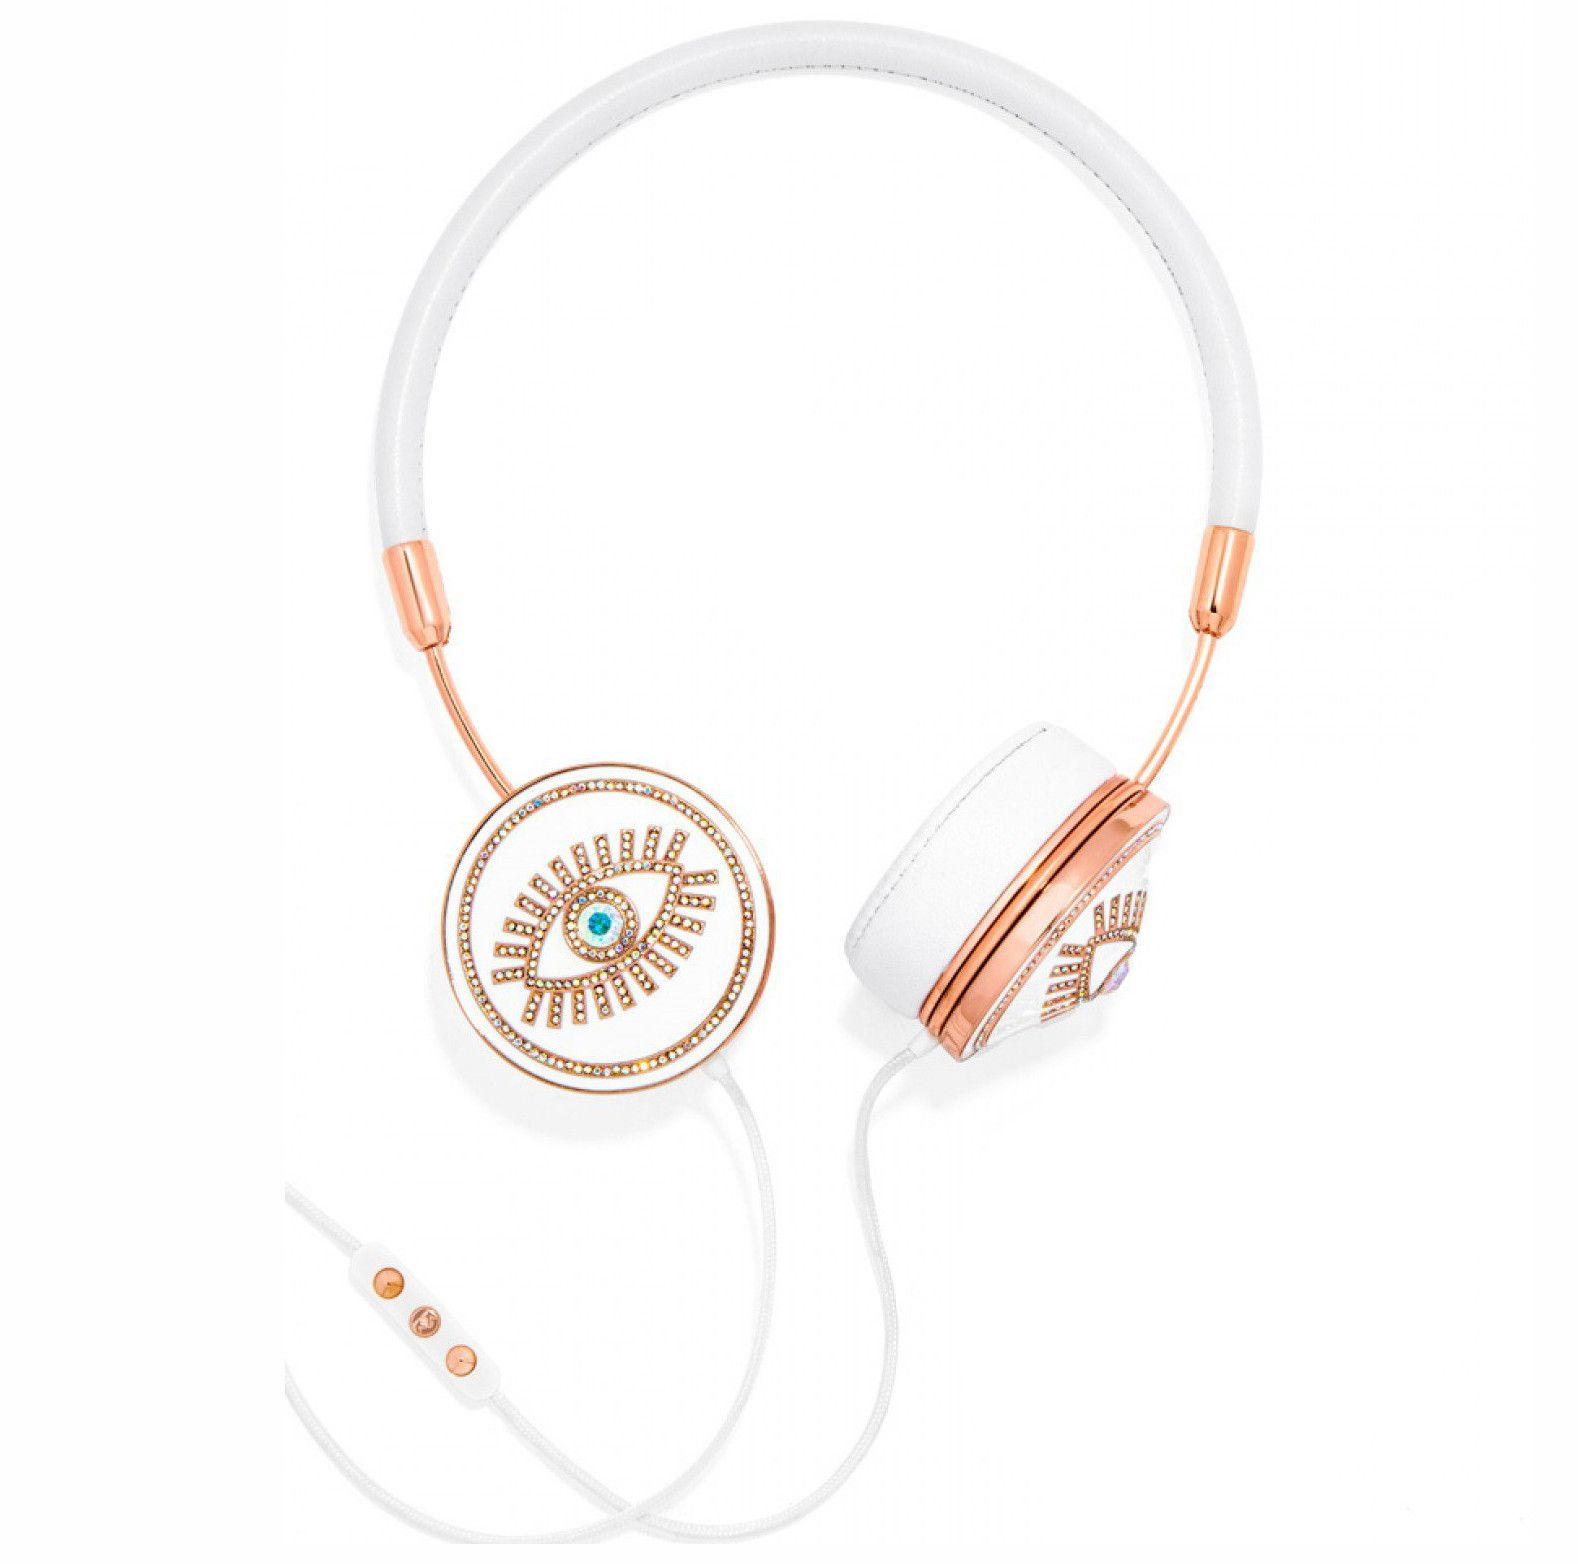 FRENDS x BaubleBar, Rose Gold & White Fortuna Headphones